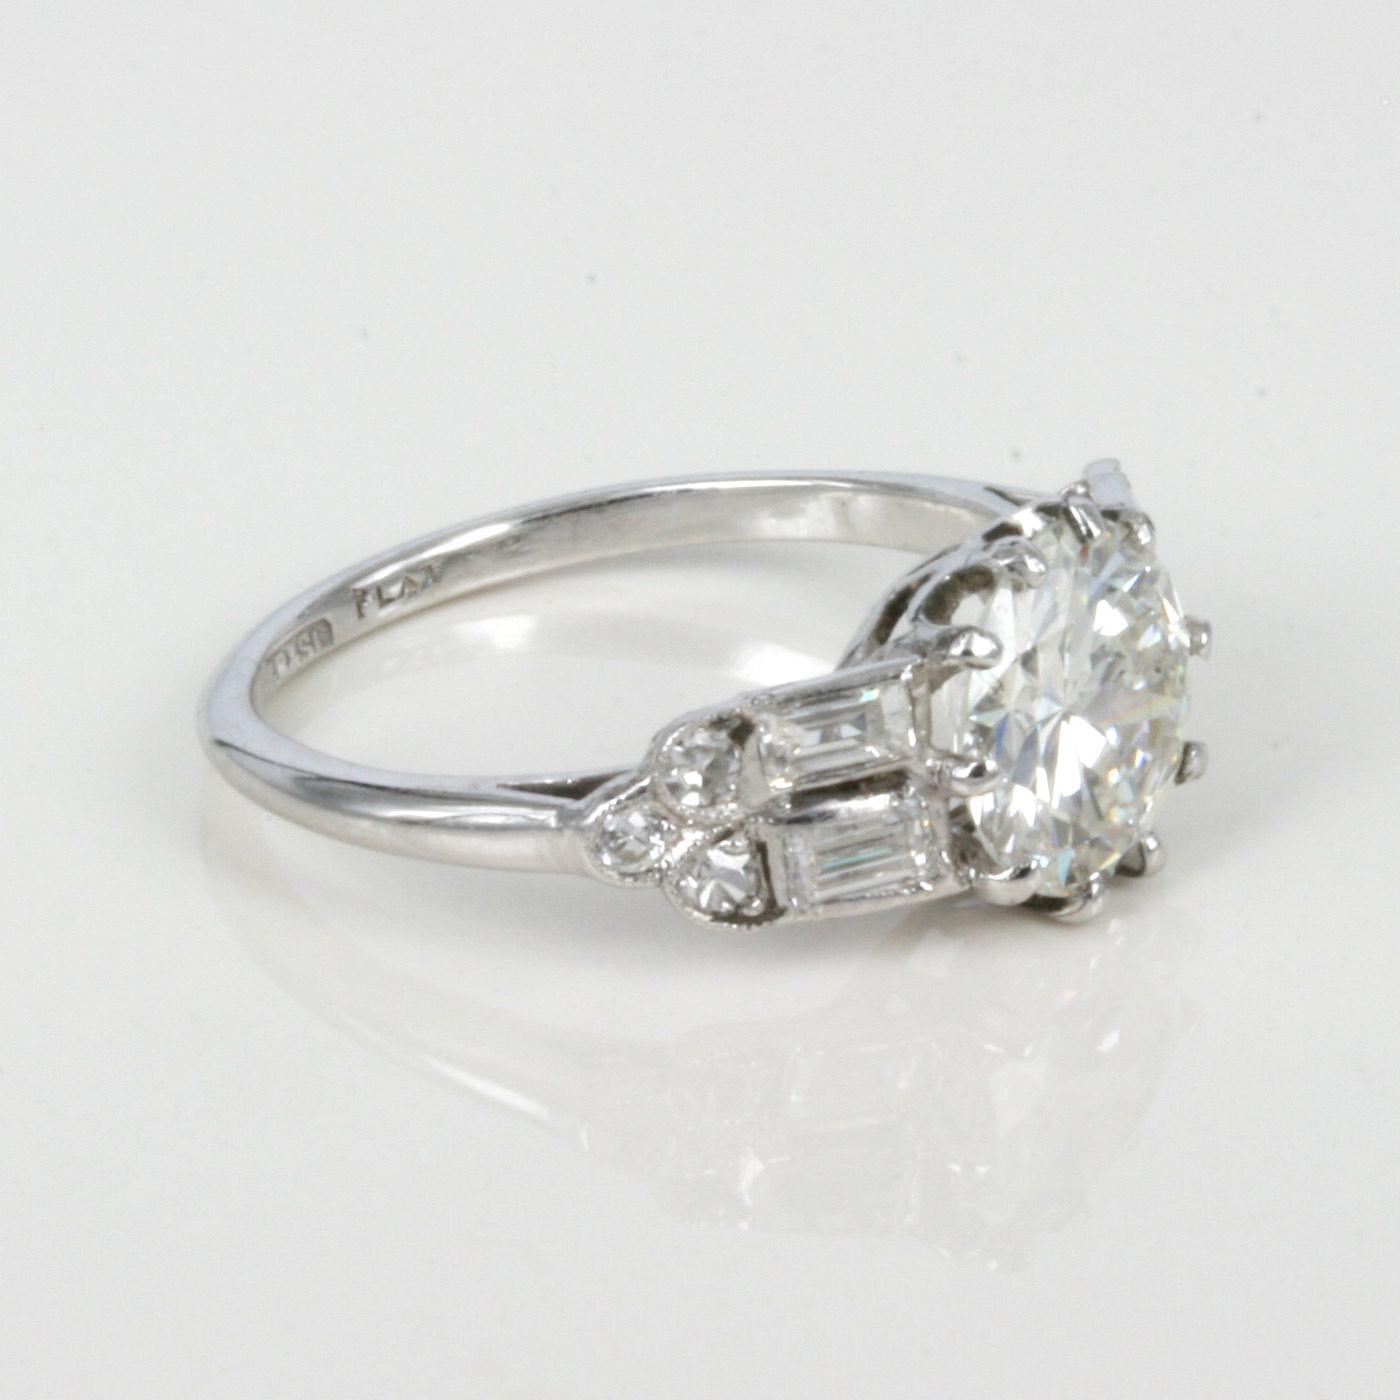 art deco enement rings wiki - Art Deco Wedding Ring